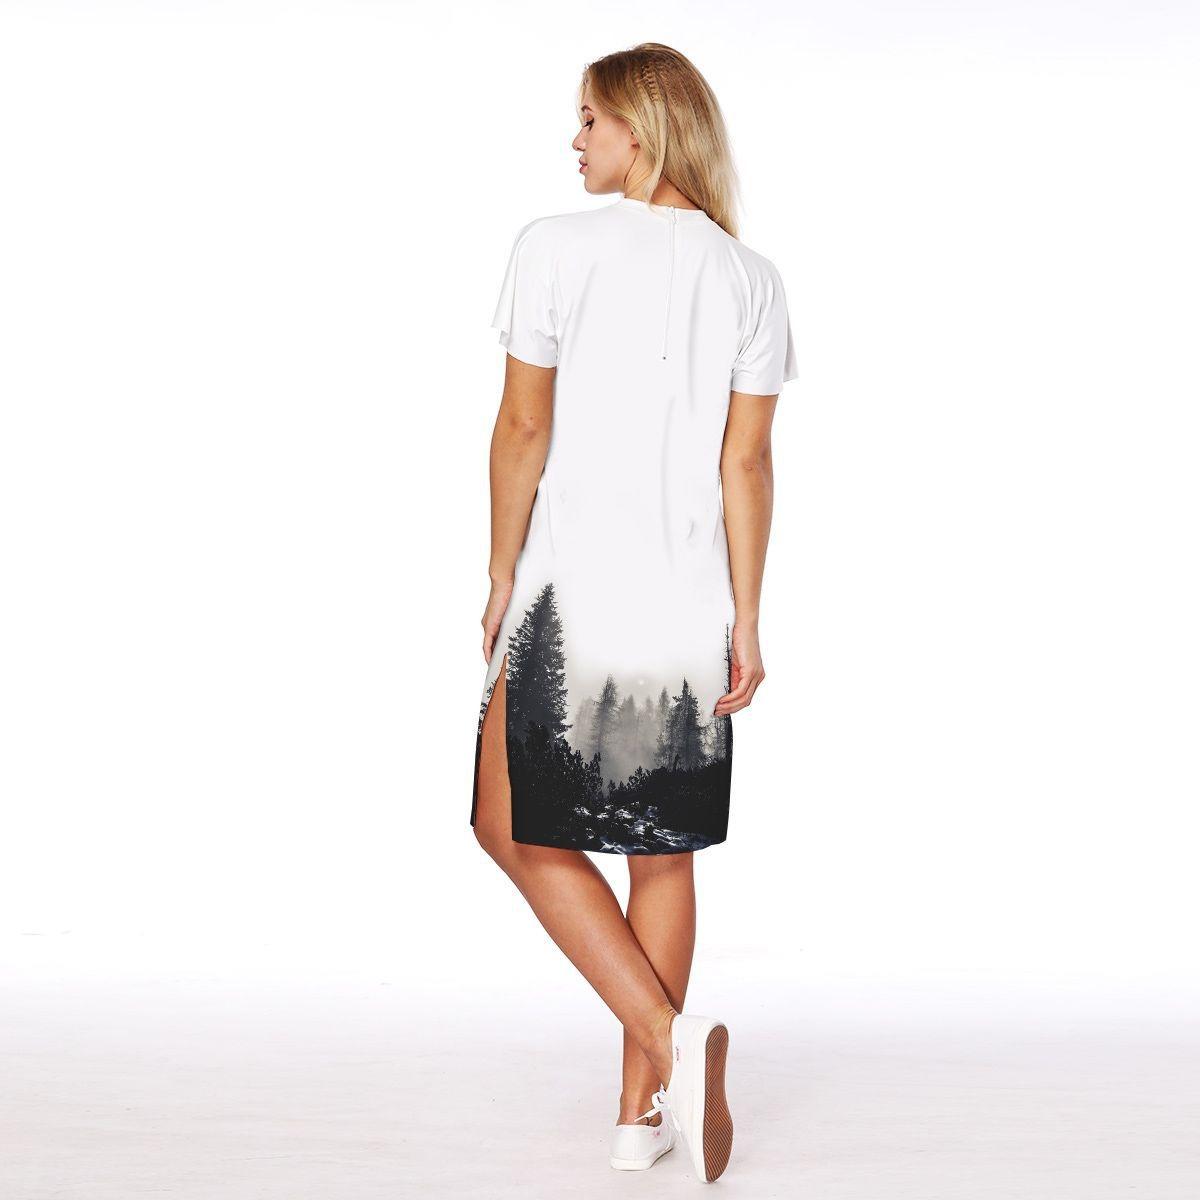 8e367e146e 3d impreso mujeres vestido cortos mangas rodilla -longitud s. Cargando zoom.